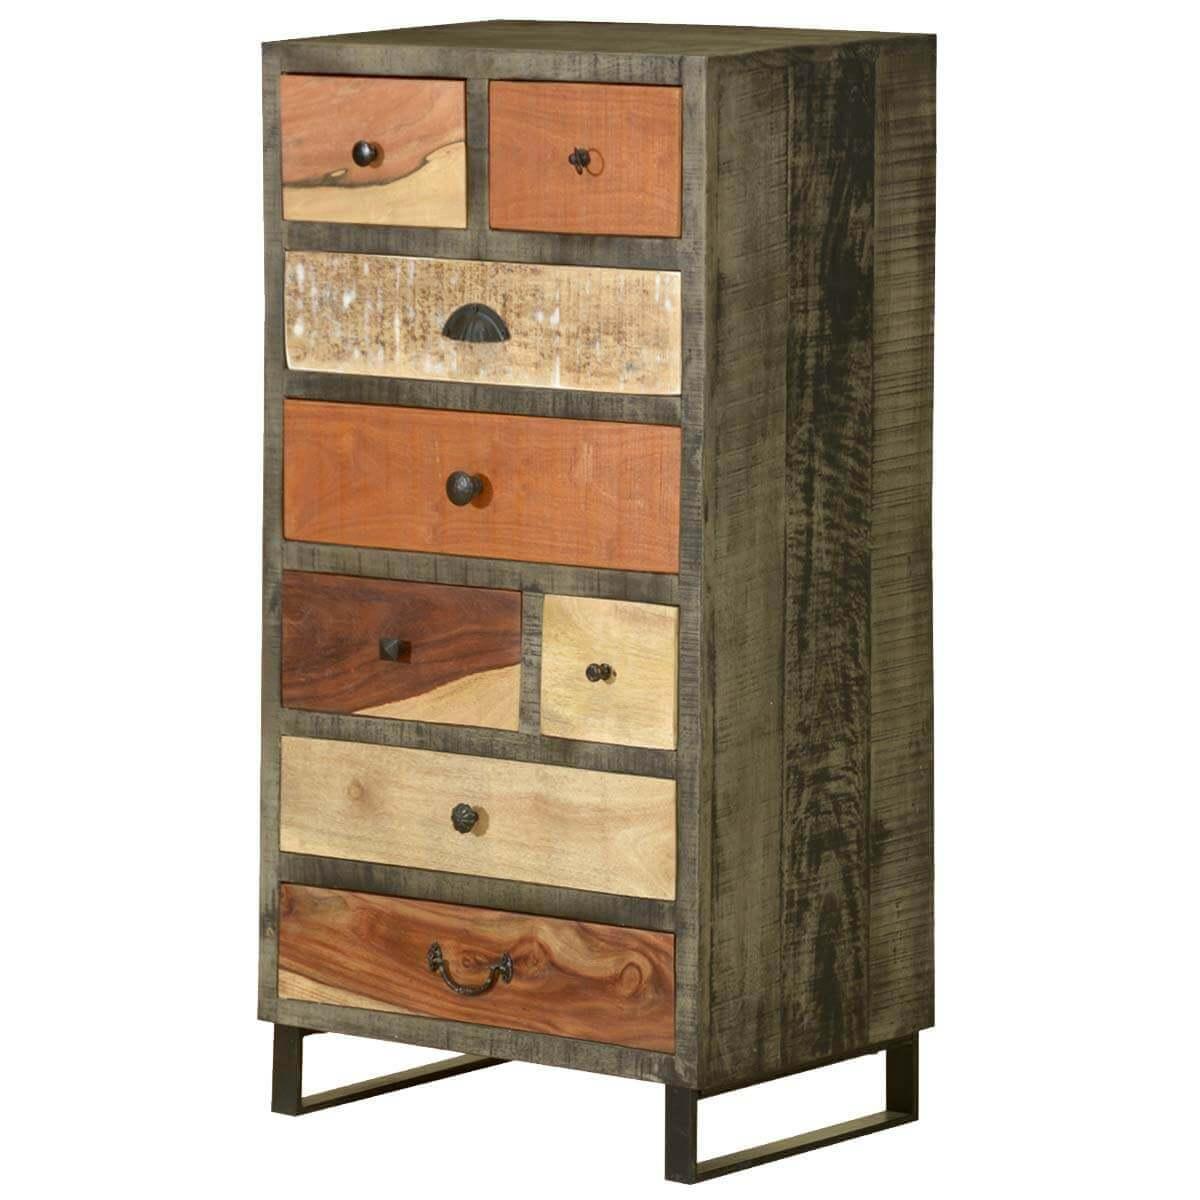 Wooden Patches Mango Wood & Iron 8 Drawer Dresser Chest